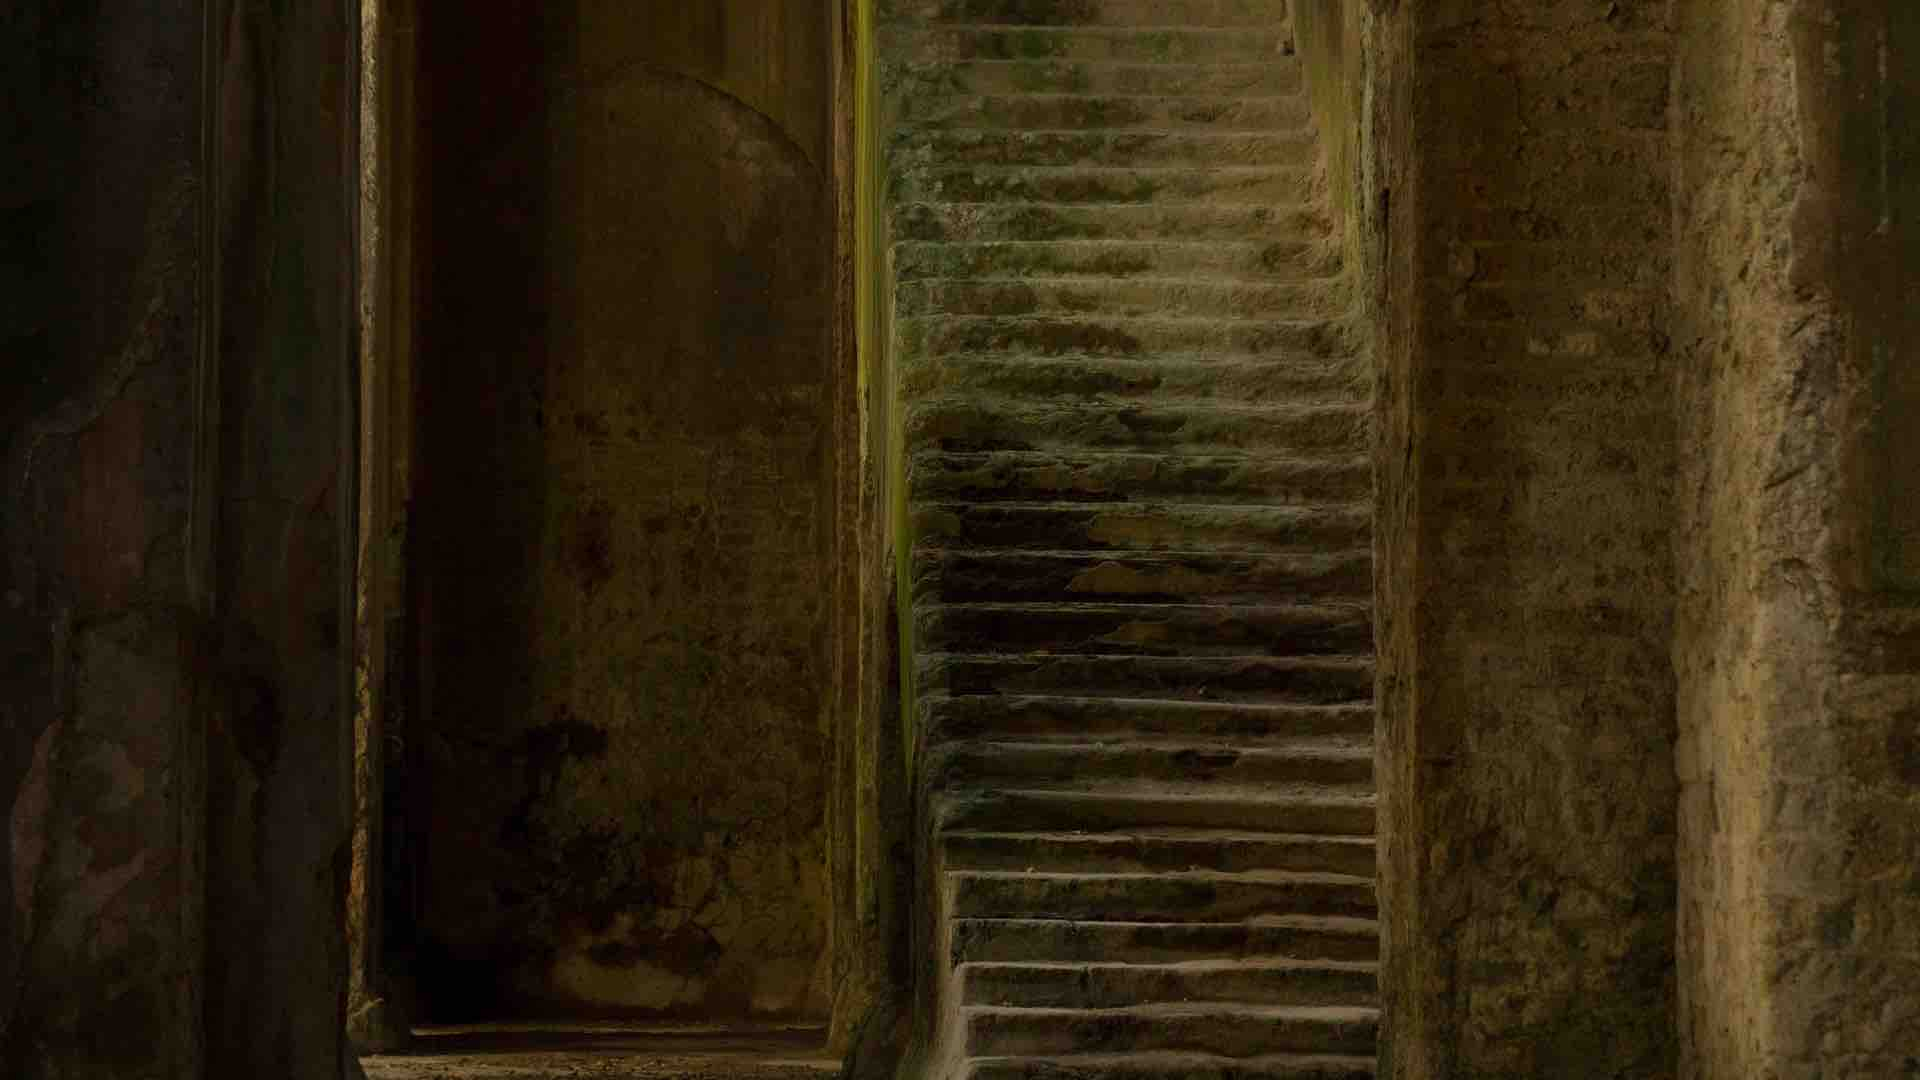 Piscina Mirabilis, una suggestiva cisterna romana